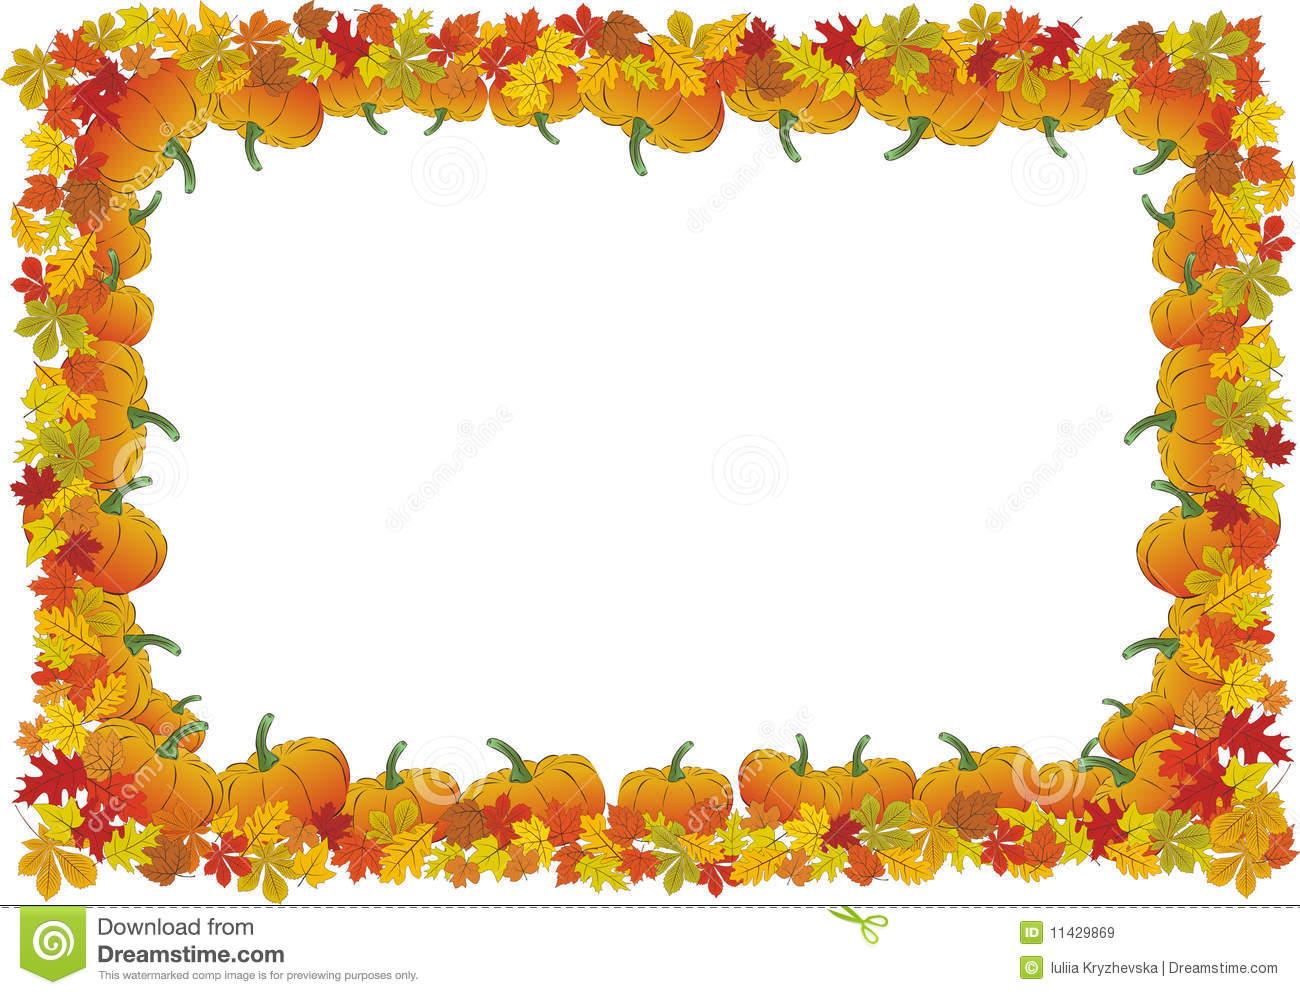 Thanksgiving Borders Clip Art ... 07368c-Thanksgiving borders clip art ... 07368c634f5f27fd8cac6b2caf3493 .-14